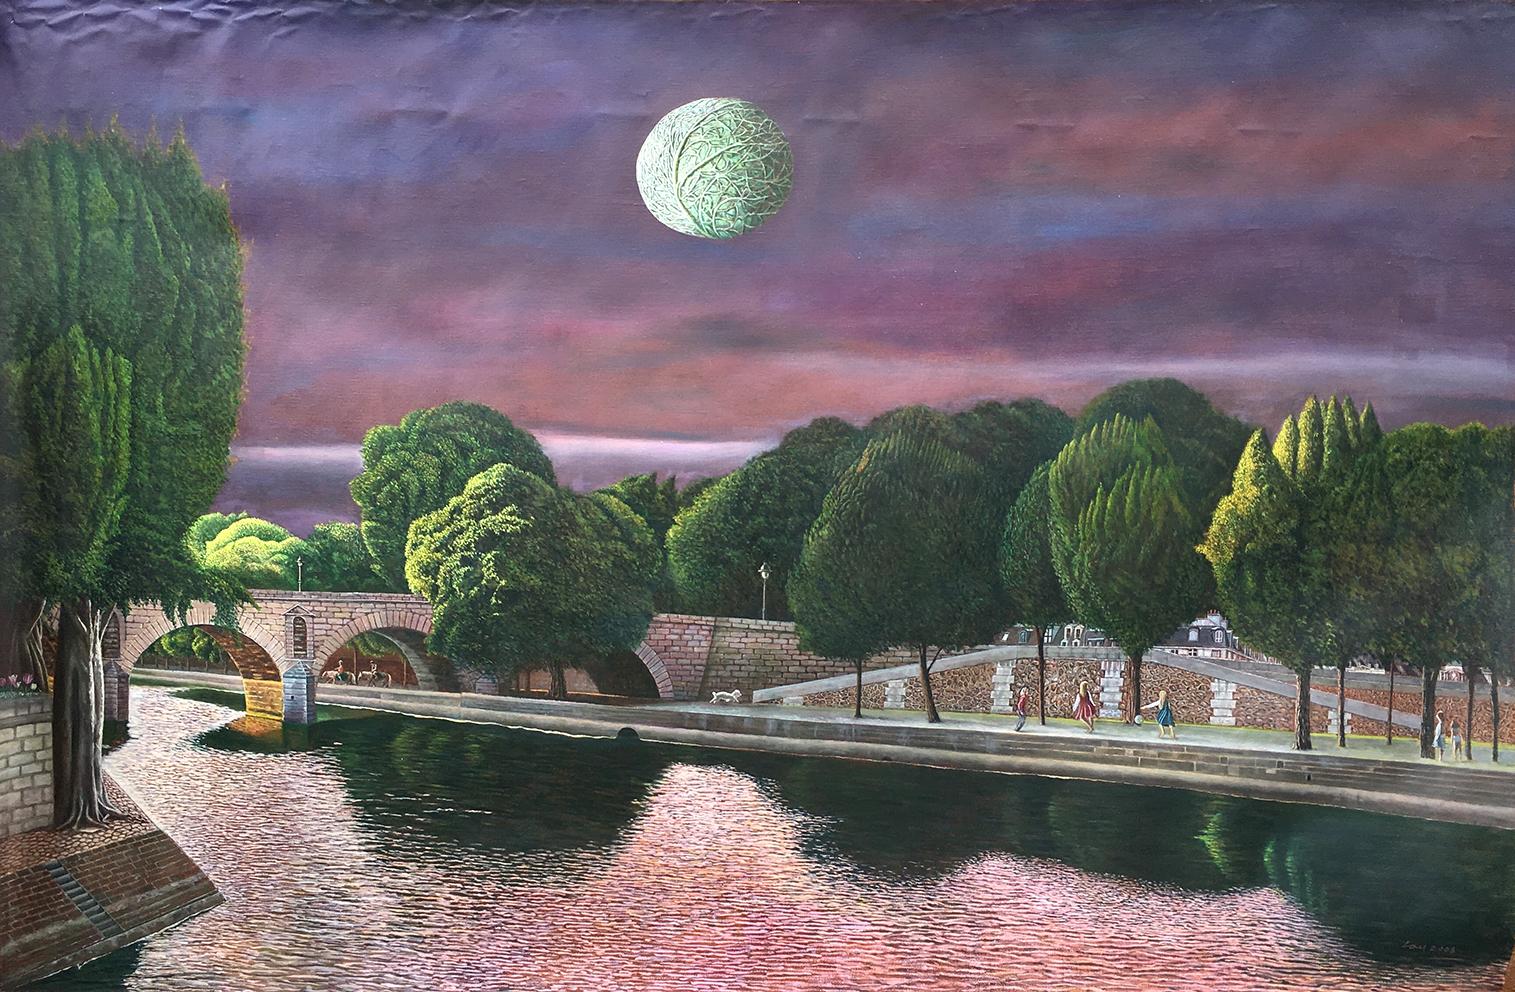 The River Seine 賽納河畔